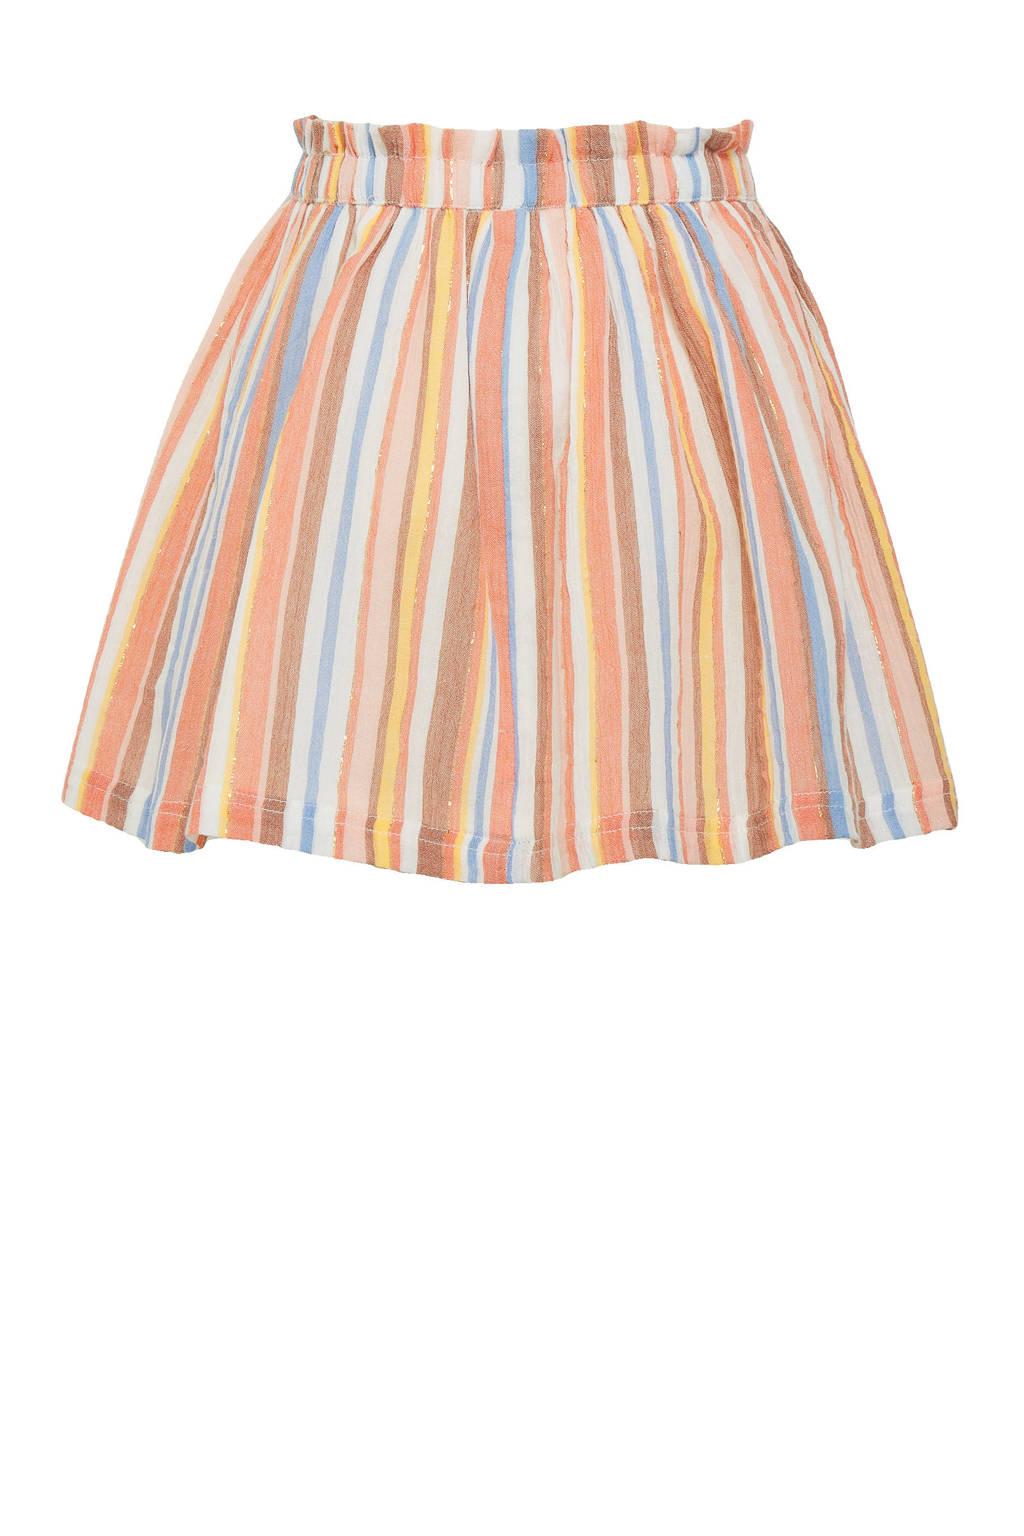 C&A Happy girls Club gestreepte rok oranje/blauw/geel, Oranje/blauw/geel